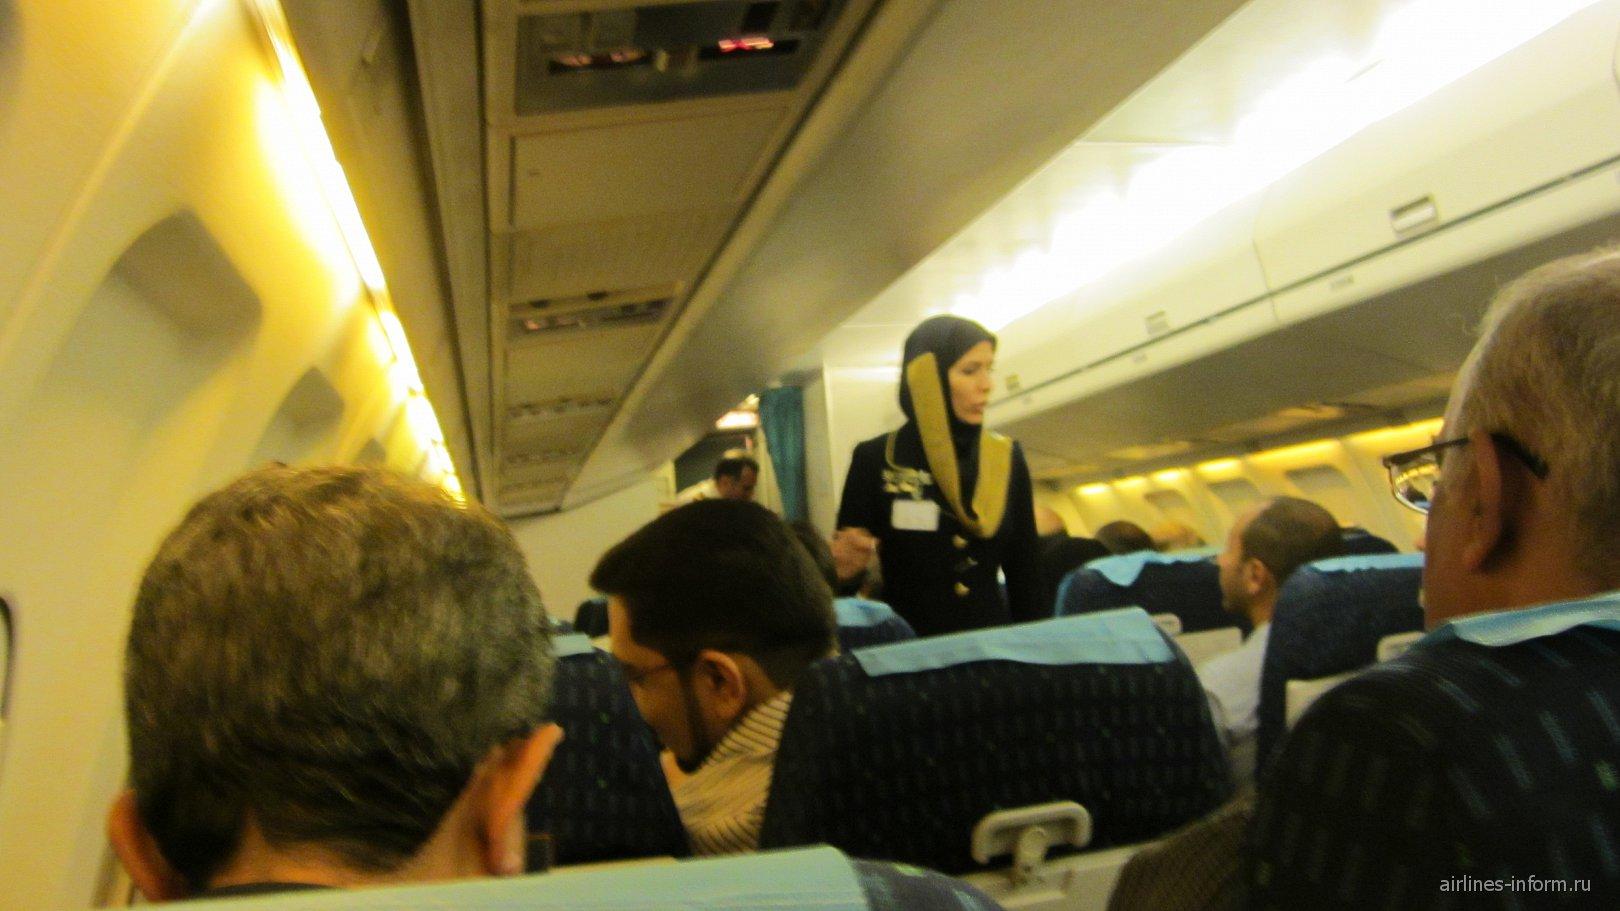 Салон самолета Fokker 100 авиакомпании Iran Air